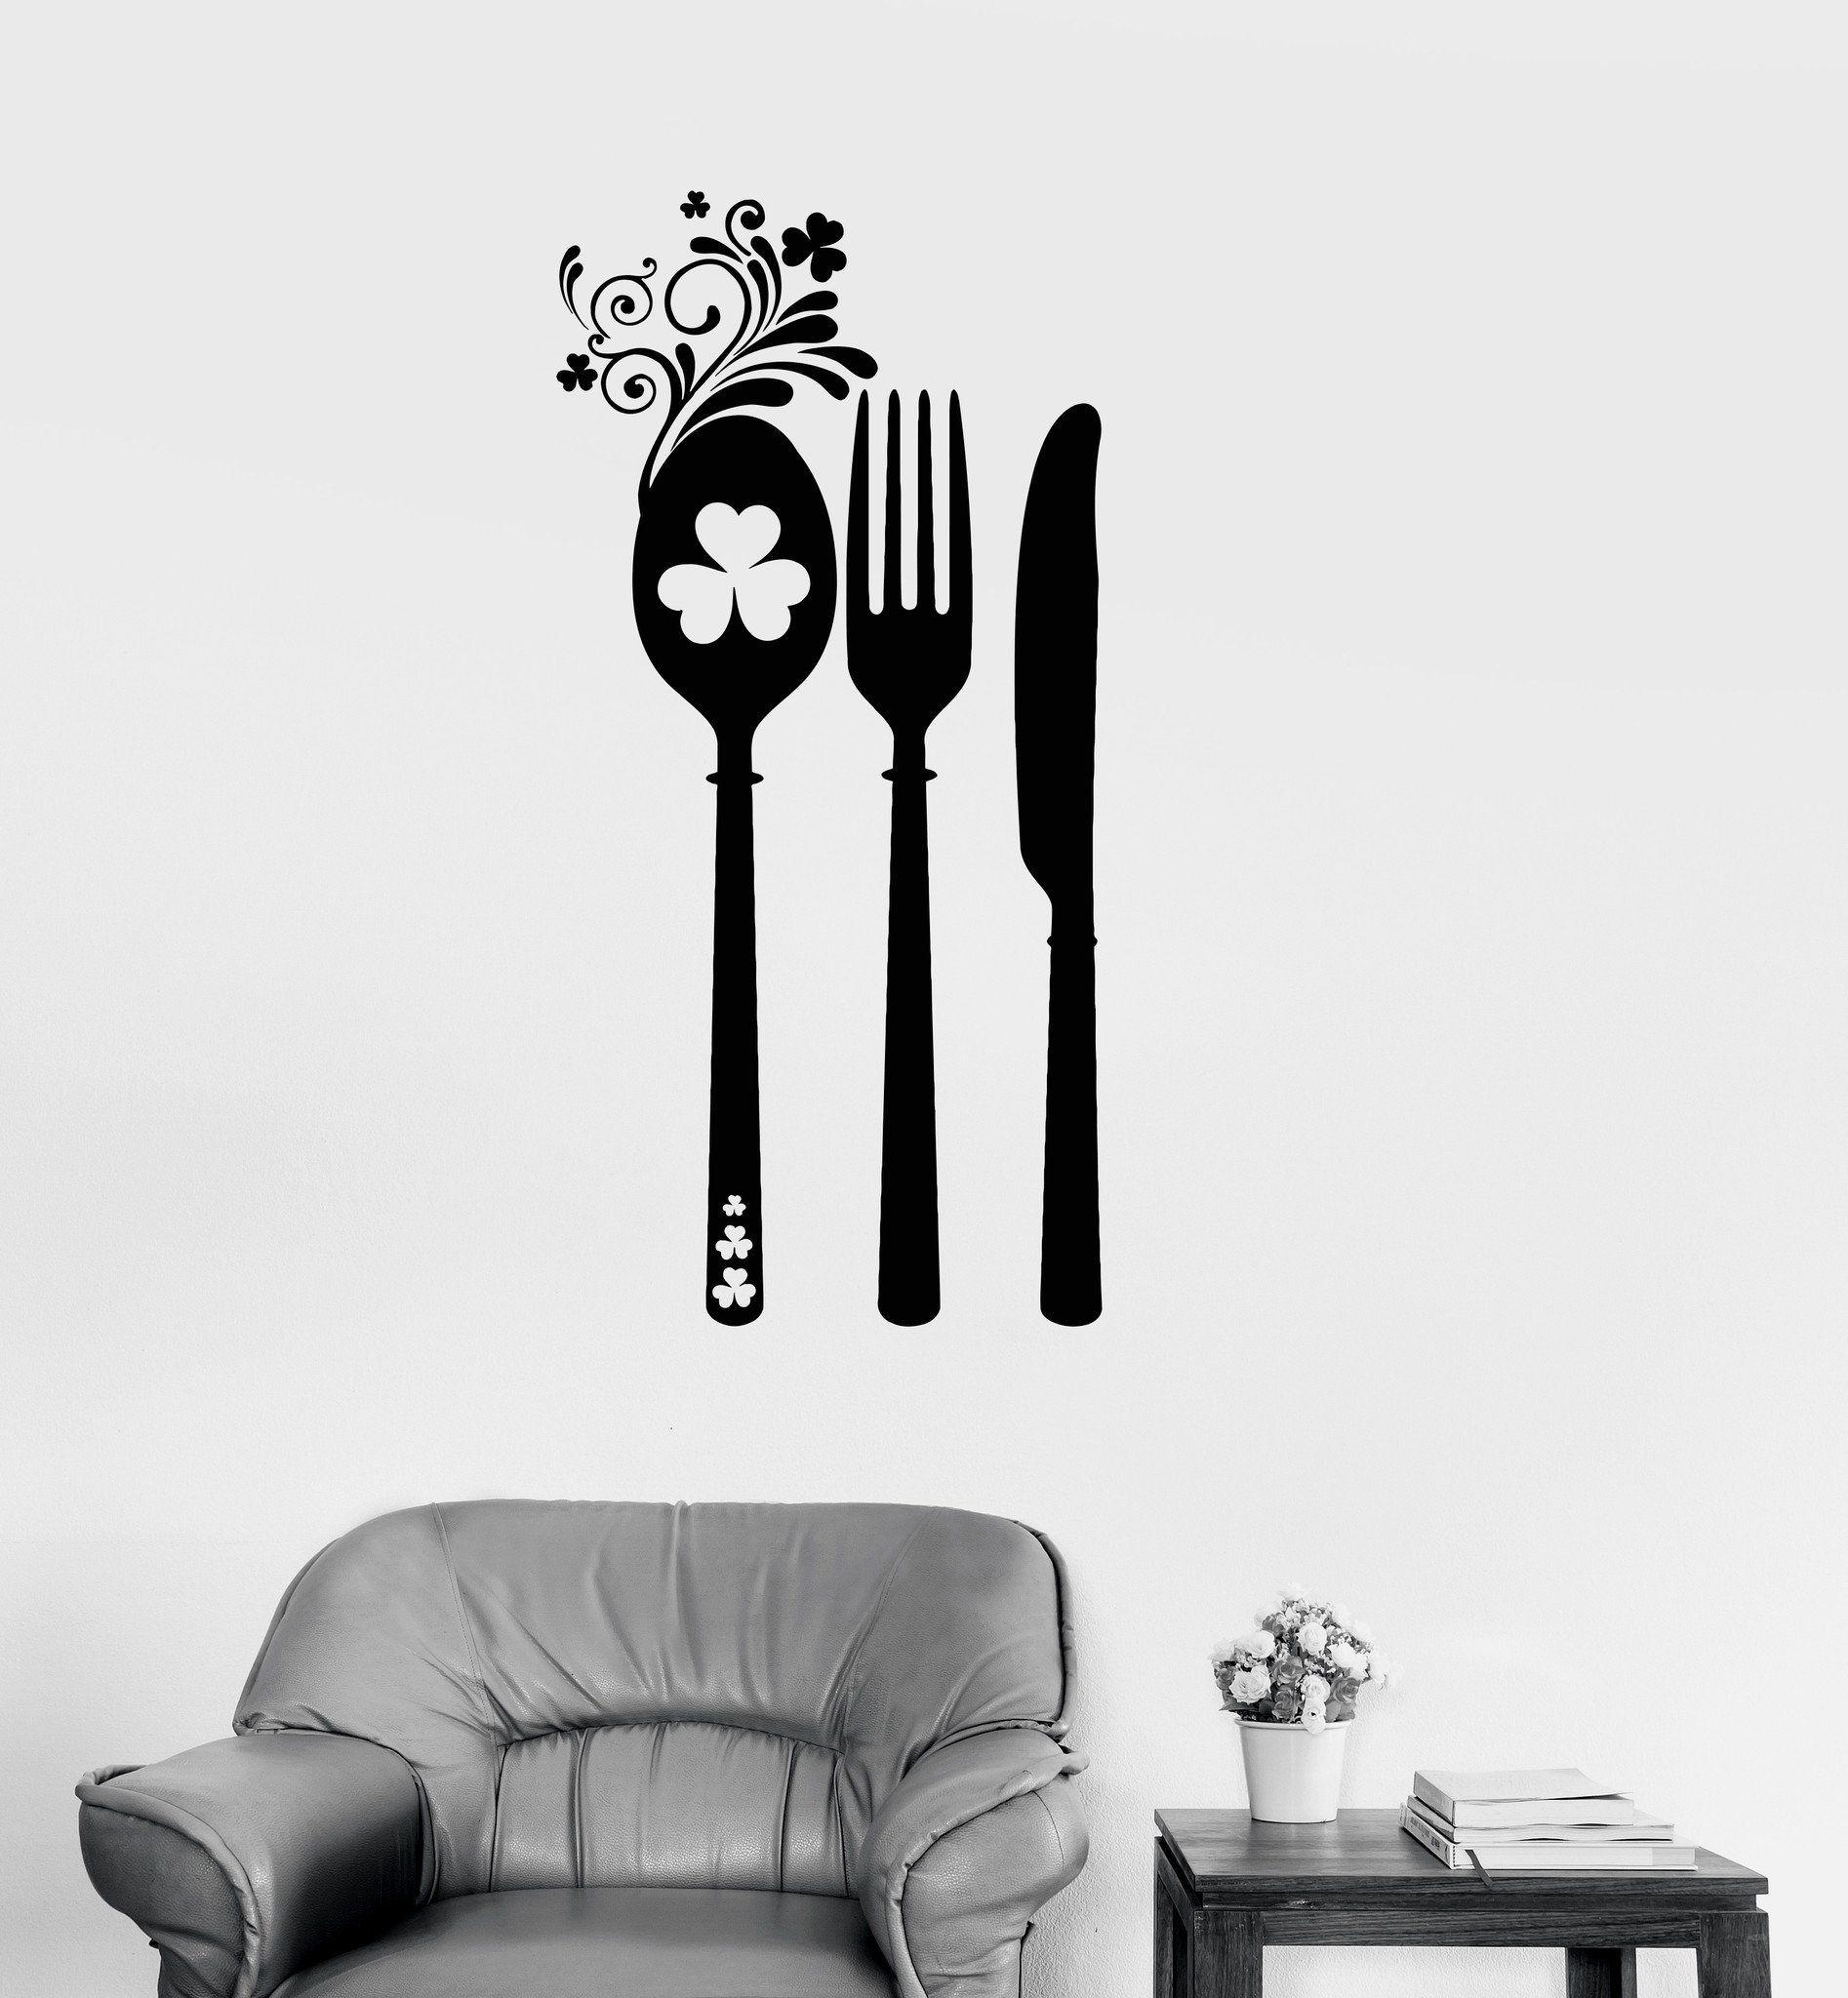 Vinyl Wall Decal Irish Cutlery Shamrock Kitchen Patterns